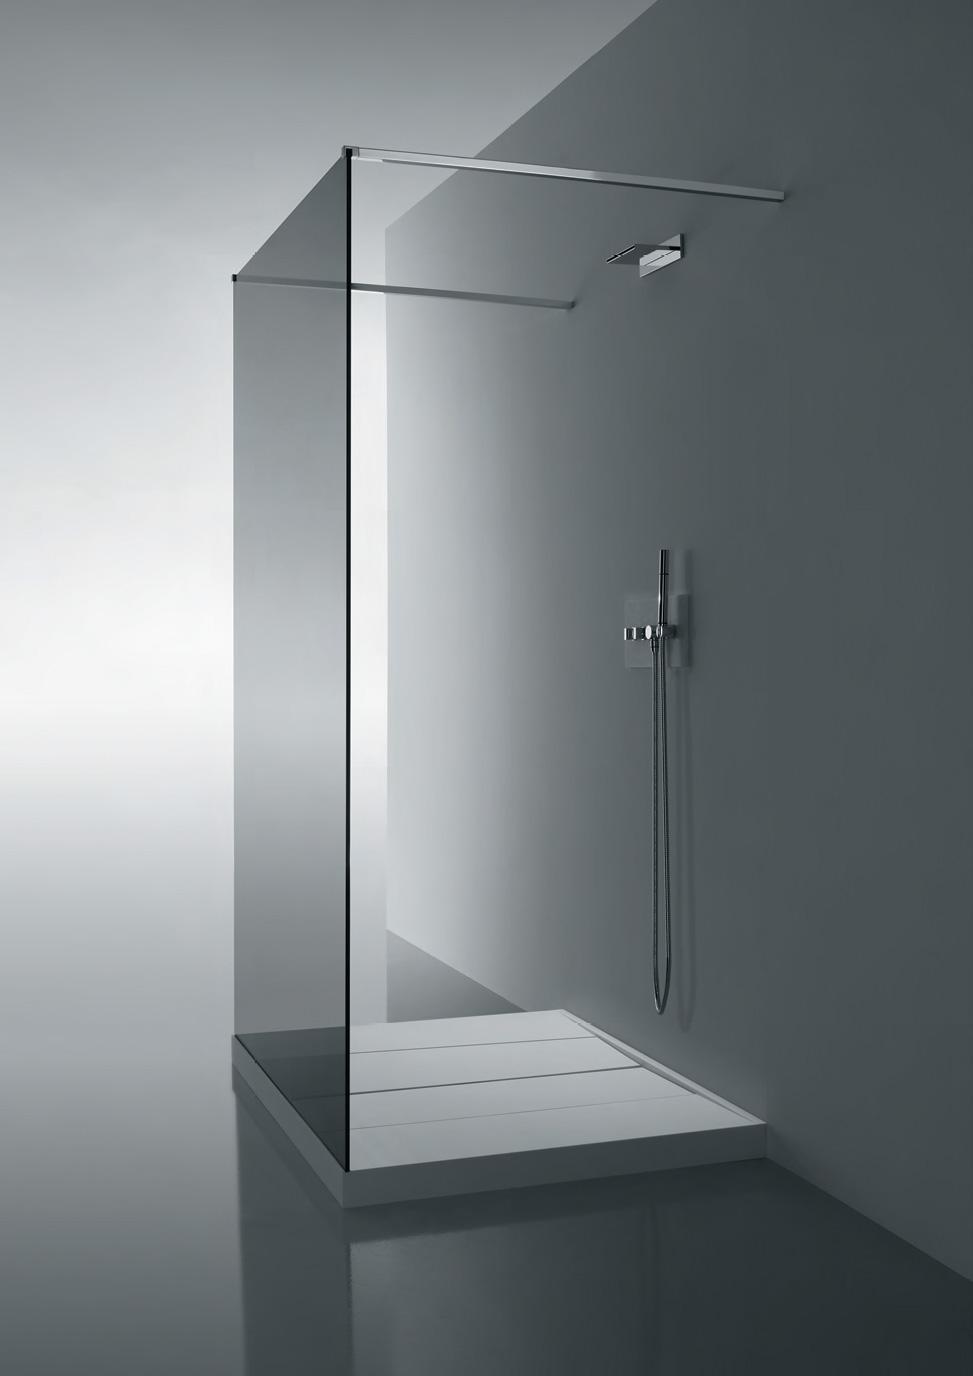 Glass wall dividers bathroom – glamor and modern style into a bathroom